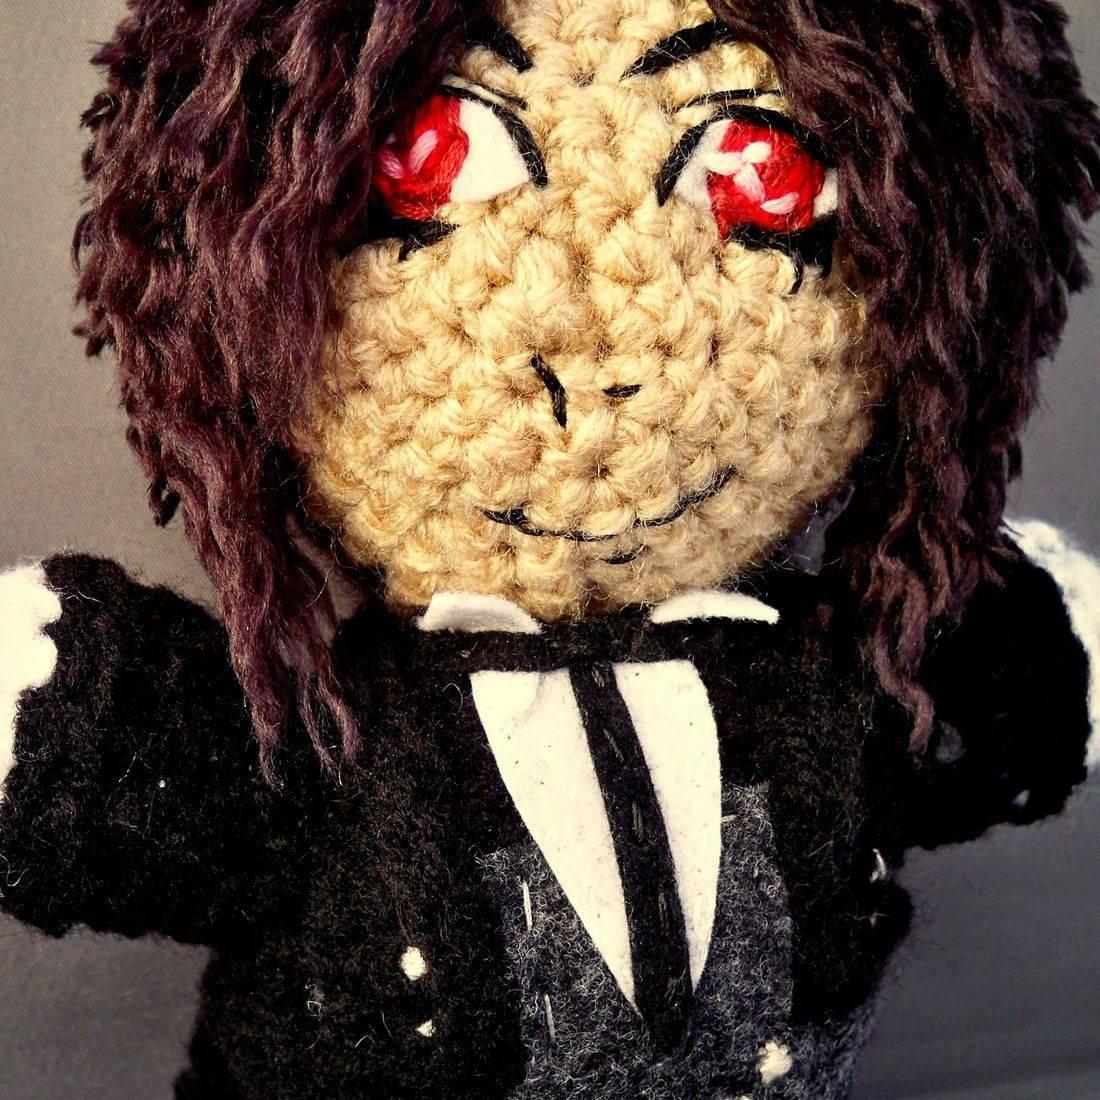 Sebastian Michaelis, Black Butler, Kuroshitsuji, Demon Butler, amigurumi, plush, doll, otaku, anime, handmade, crochet